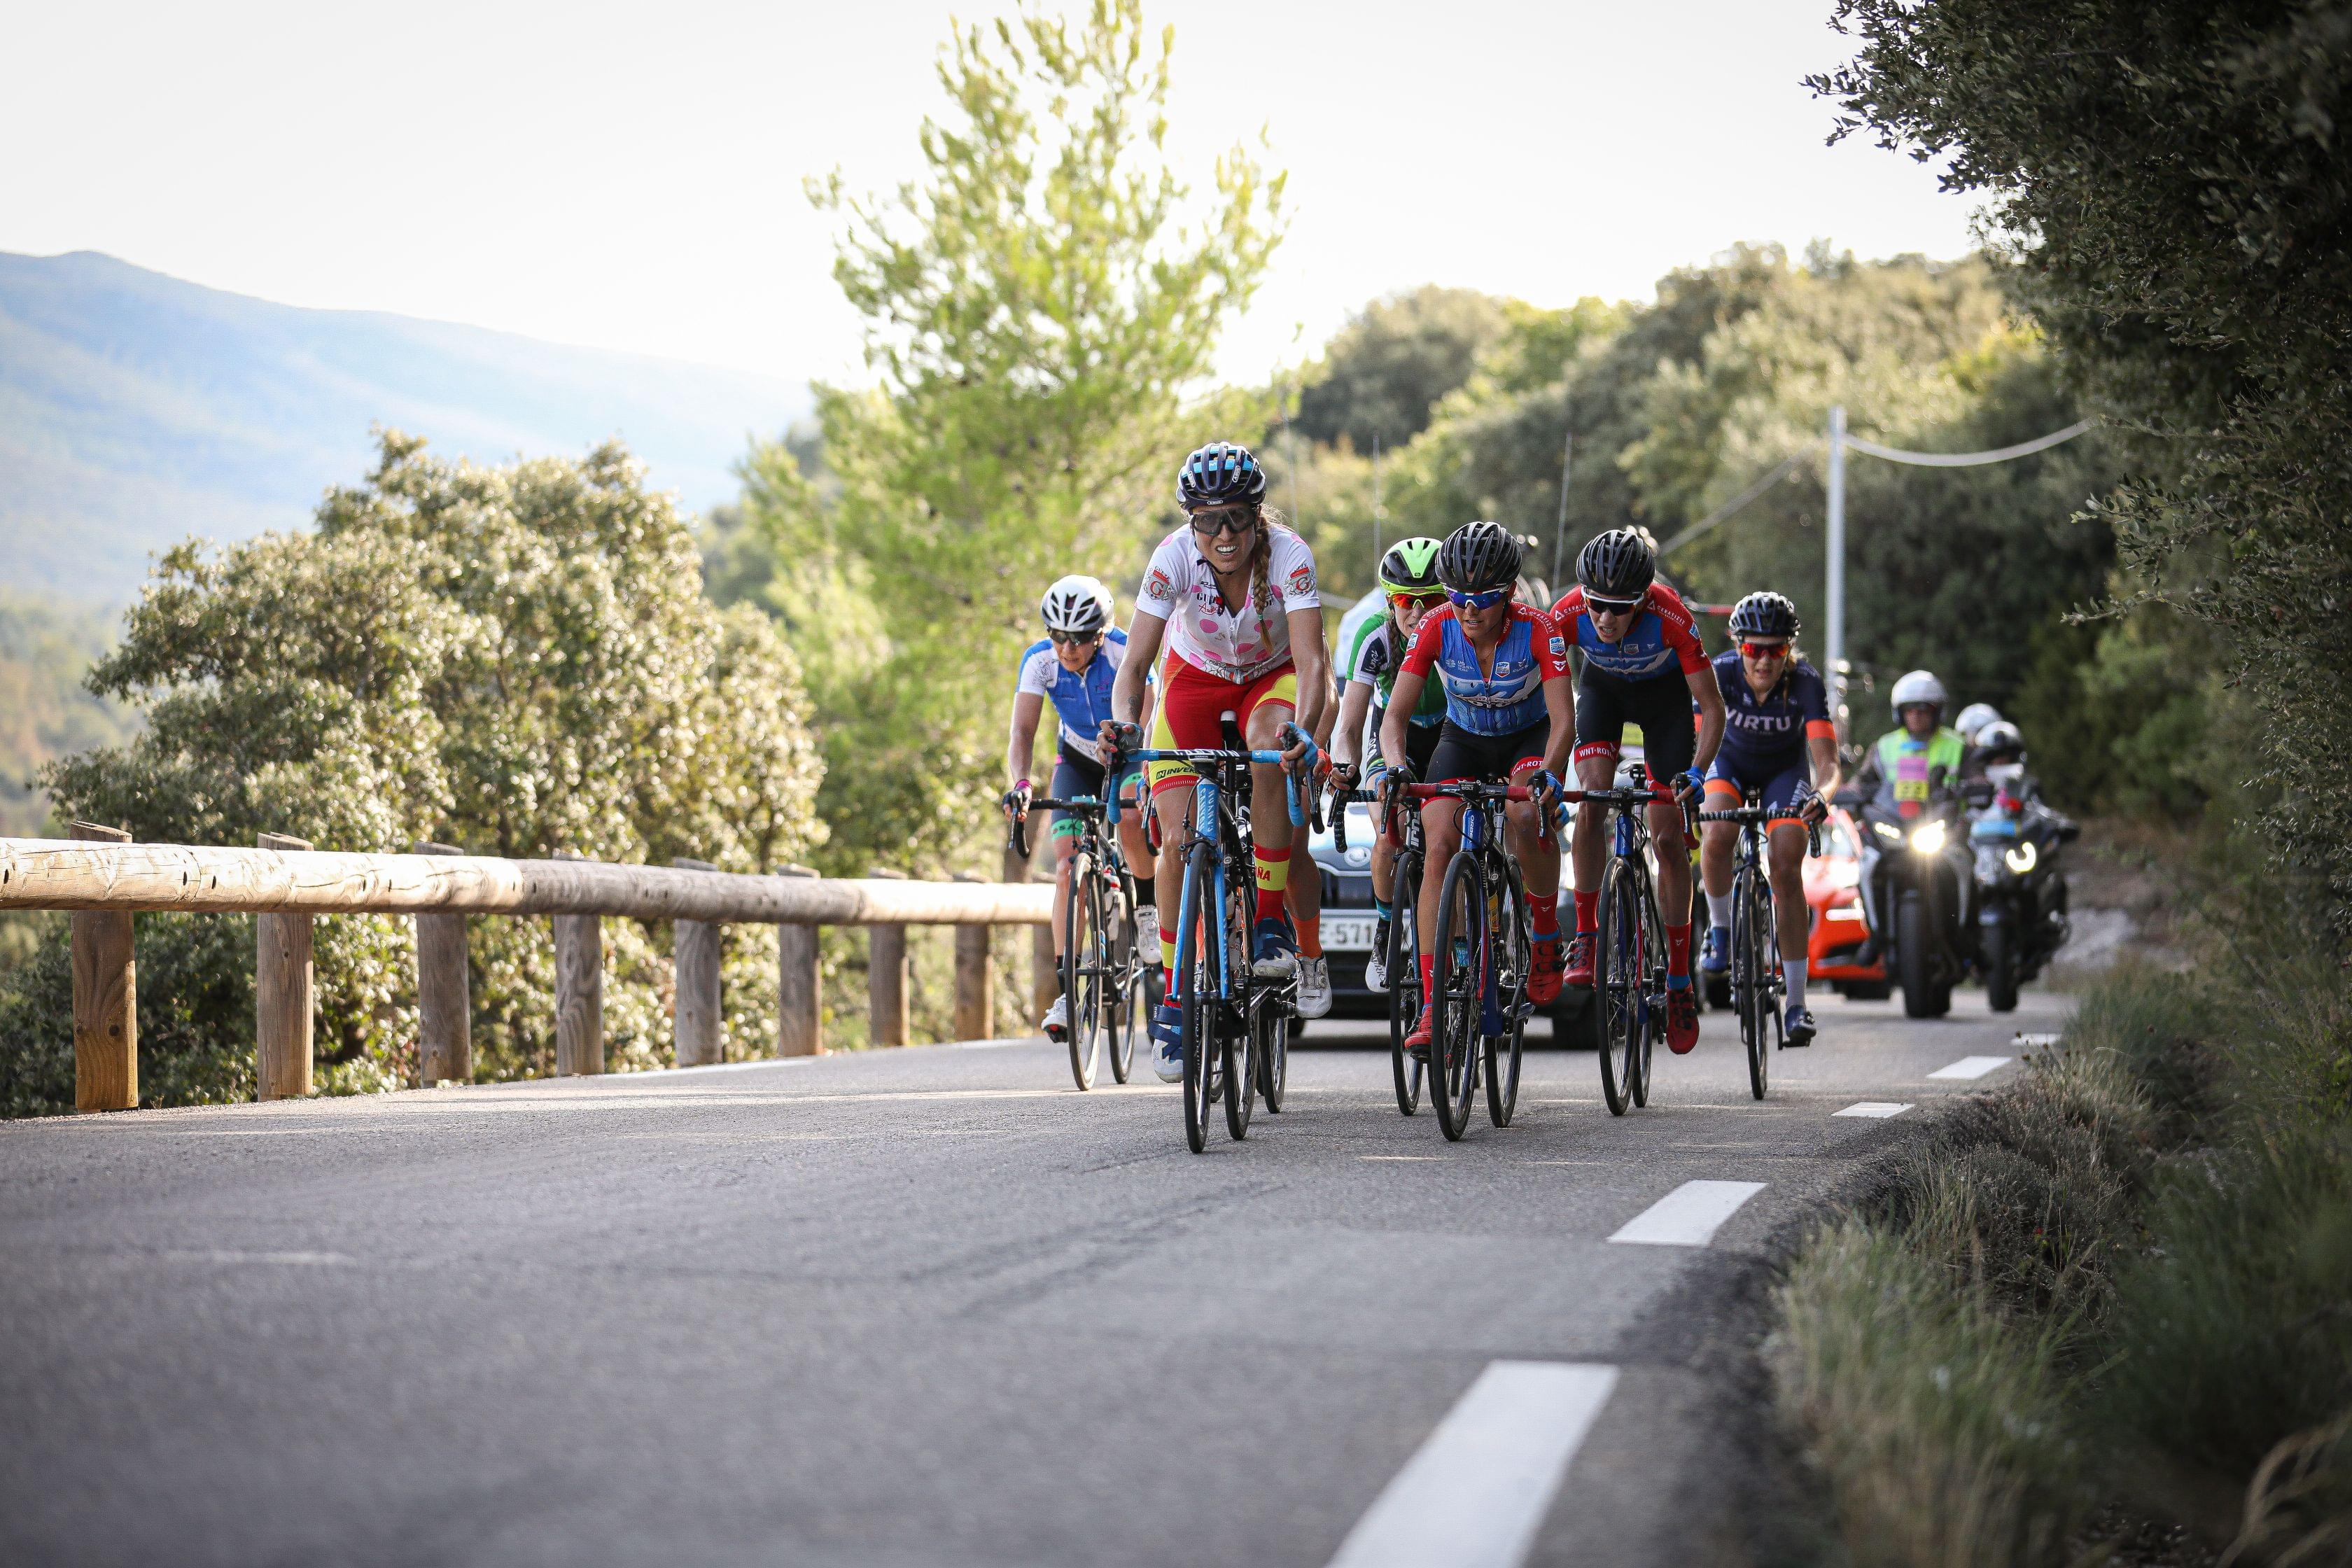 #TeamESPciclismo / Tour de Ardeche 2019